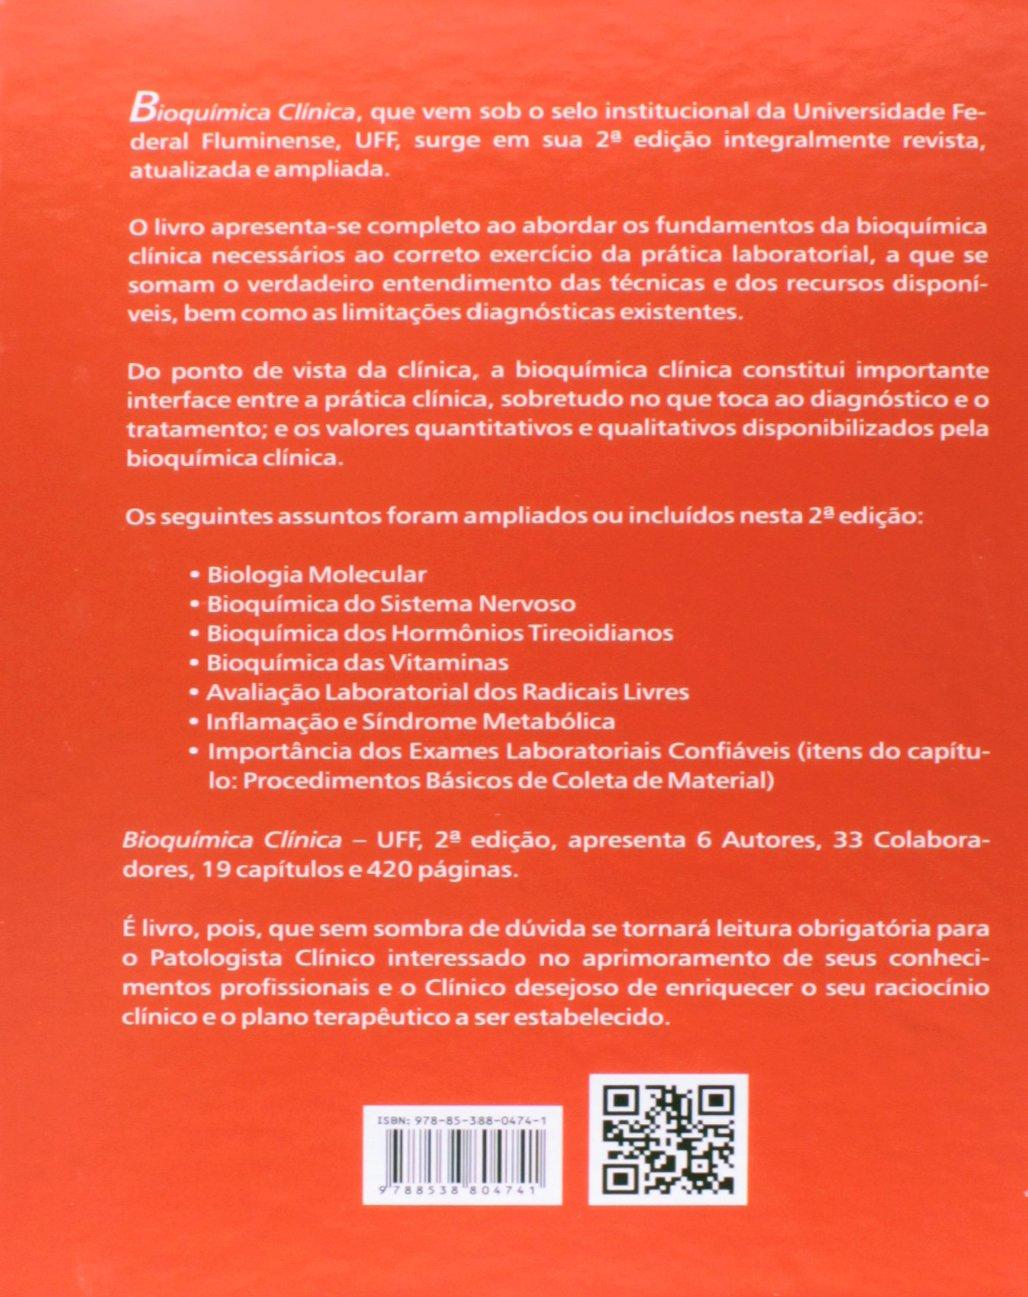 Bioquímica Clínica (Em Portuguese do Brasil): Amazon.es: Maria Alice Terra Garcia: Libros